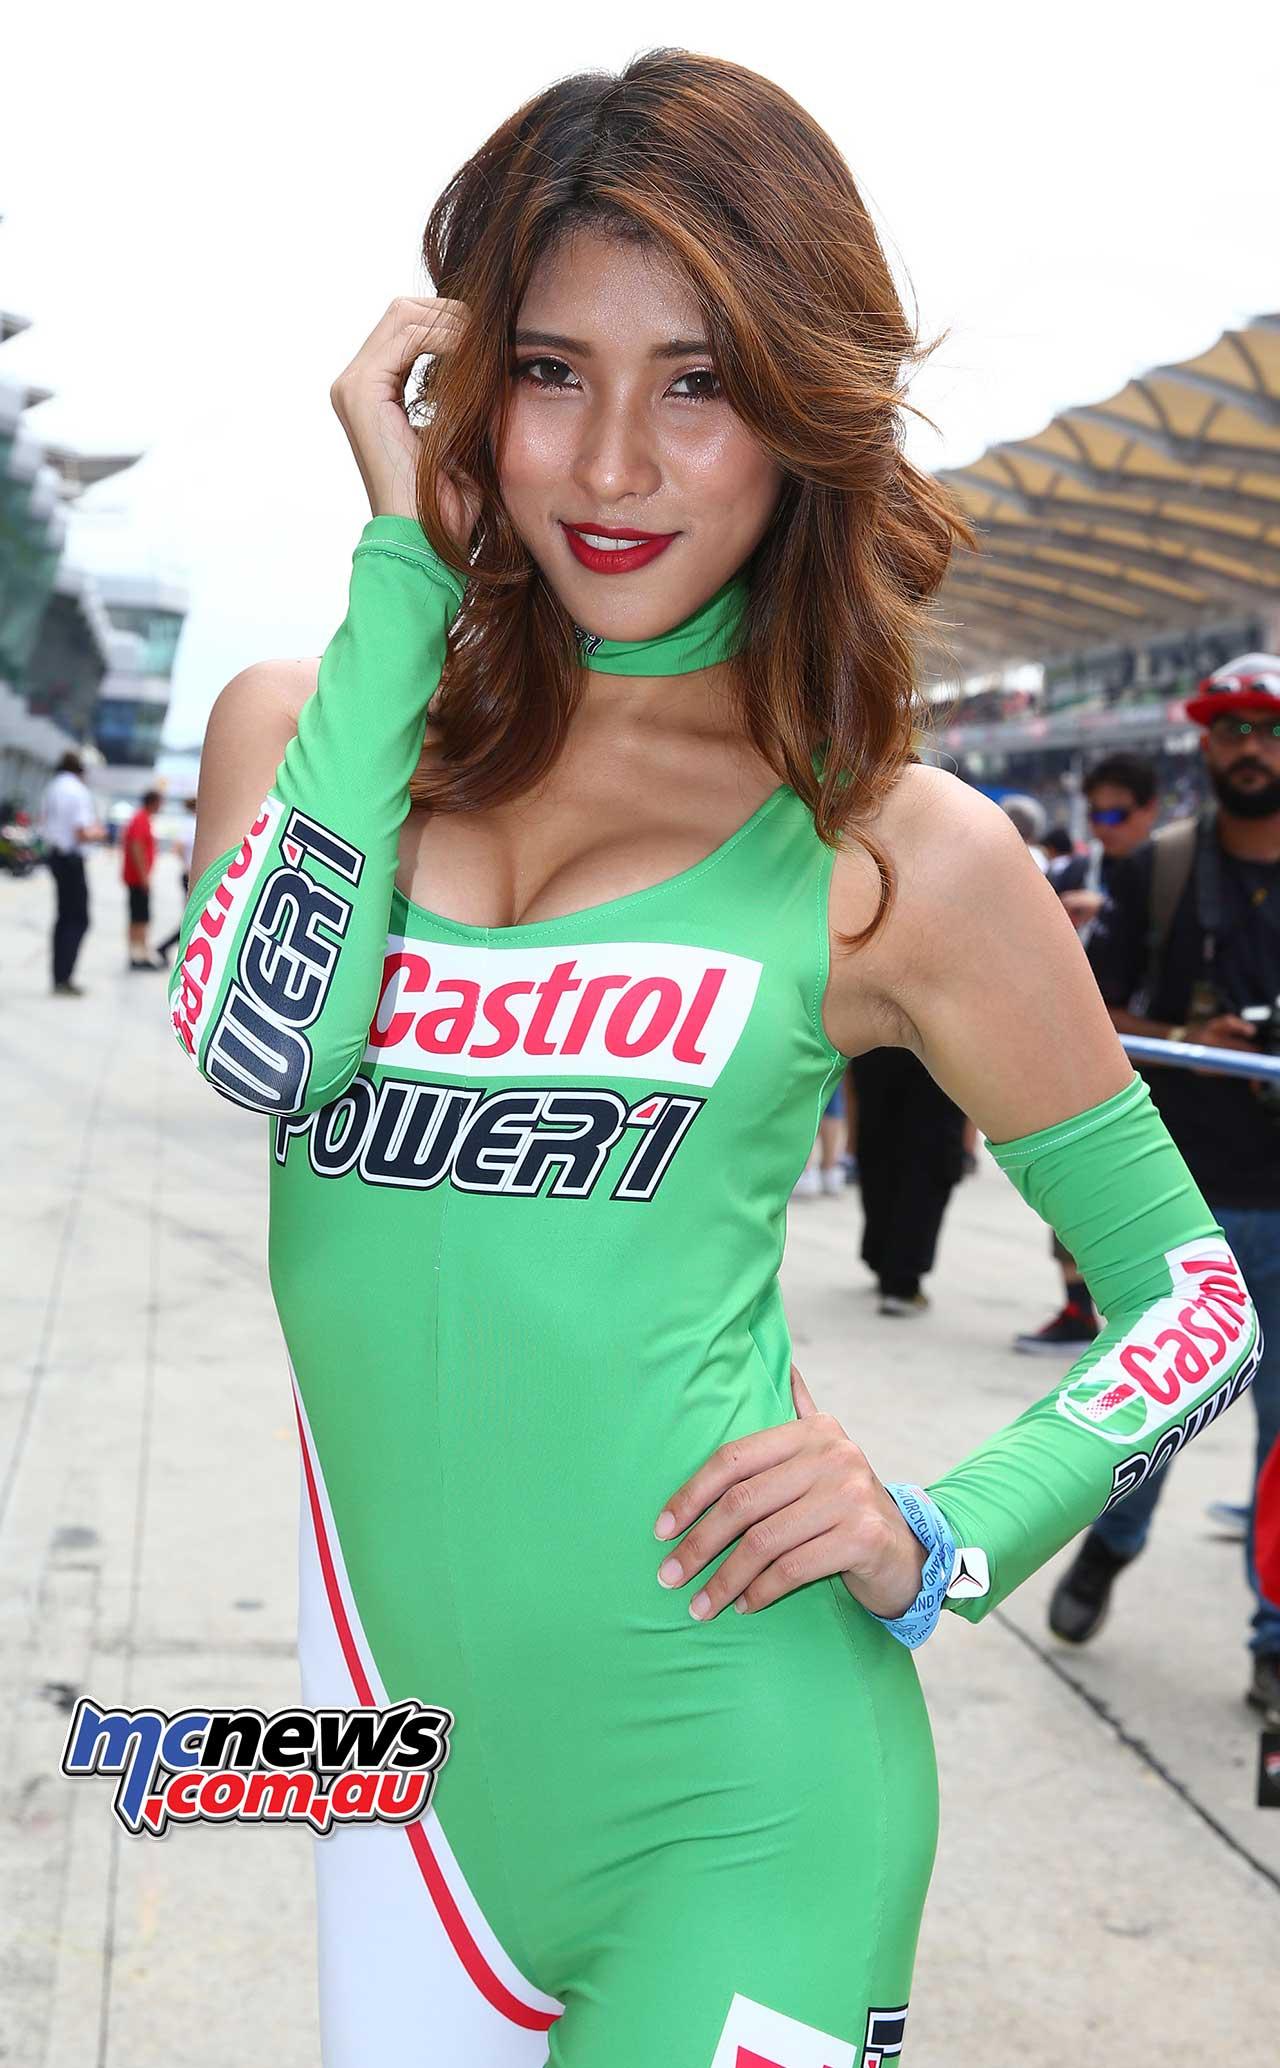 Best Enduro Motorcycle >> 2017 Sepang MotoGP Grid Girls   MCNews.com.au